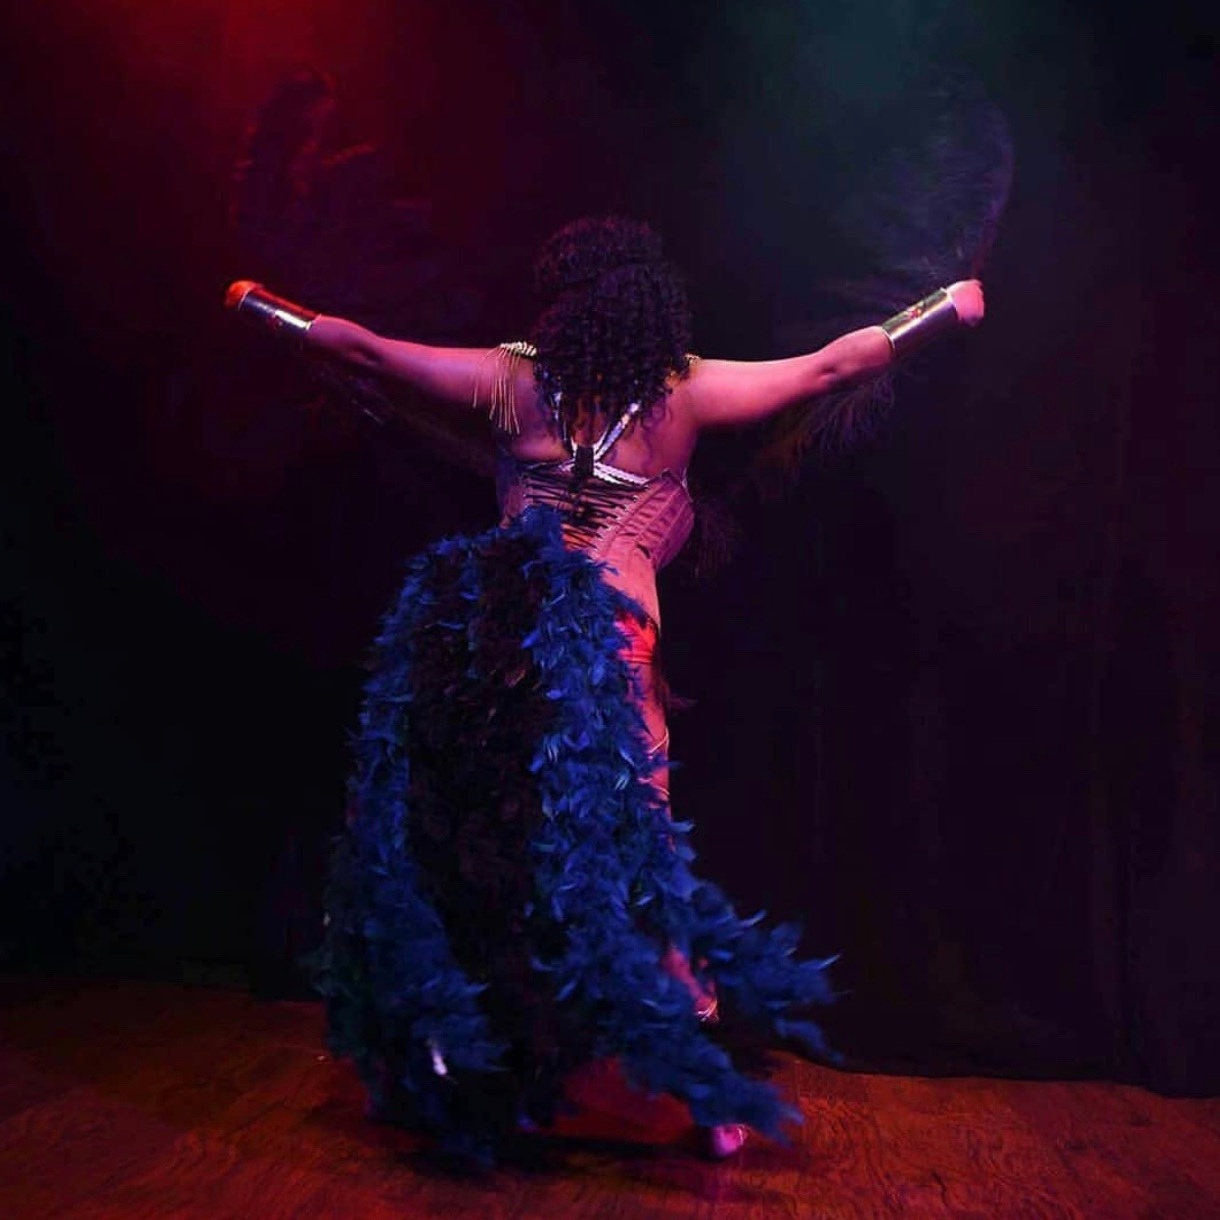 Farris Maiden   Farris is a professional Burlesque performer originally from Missouri.